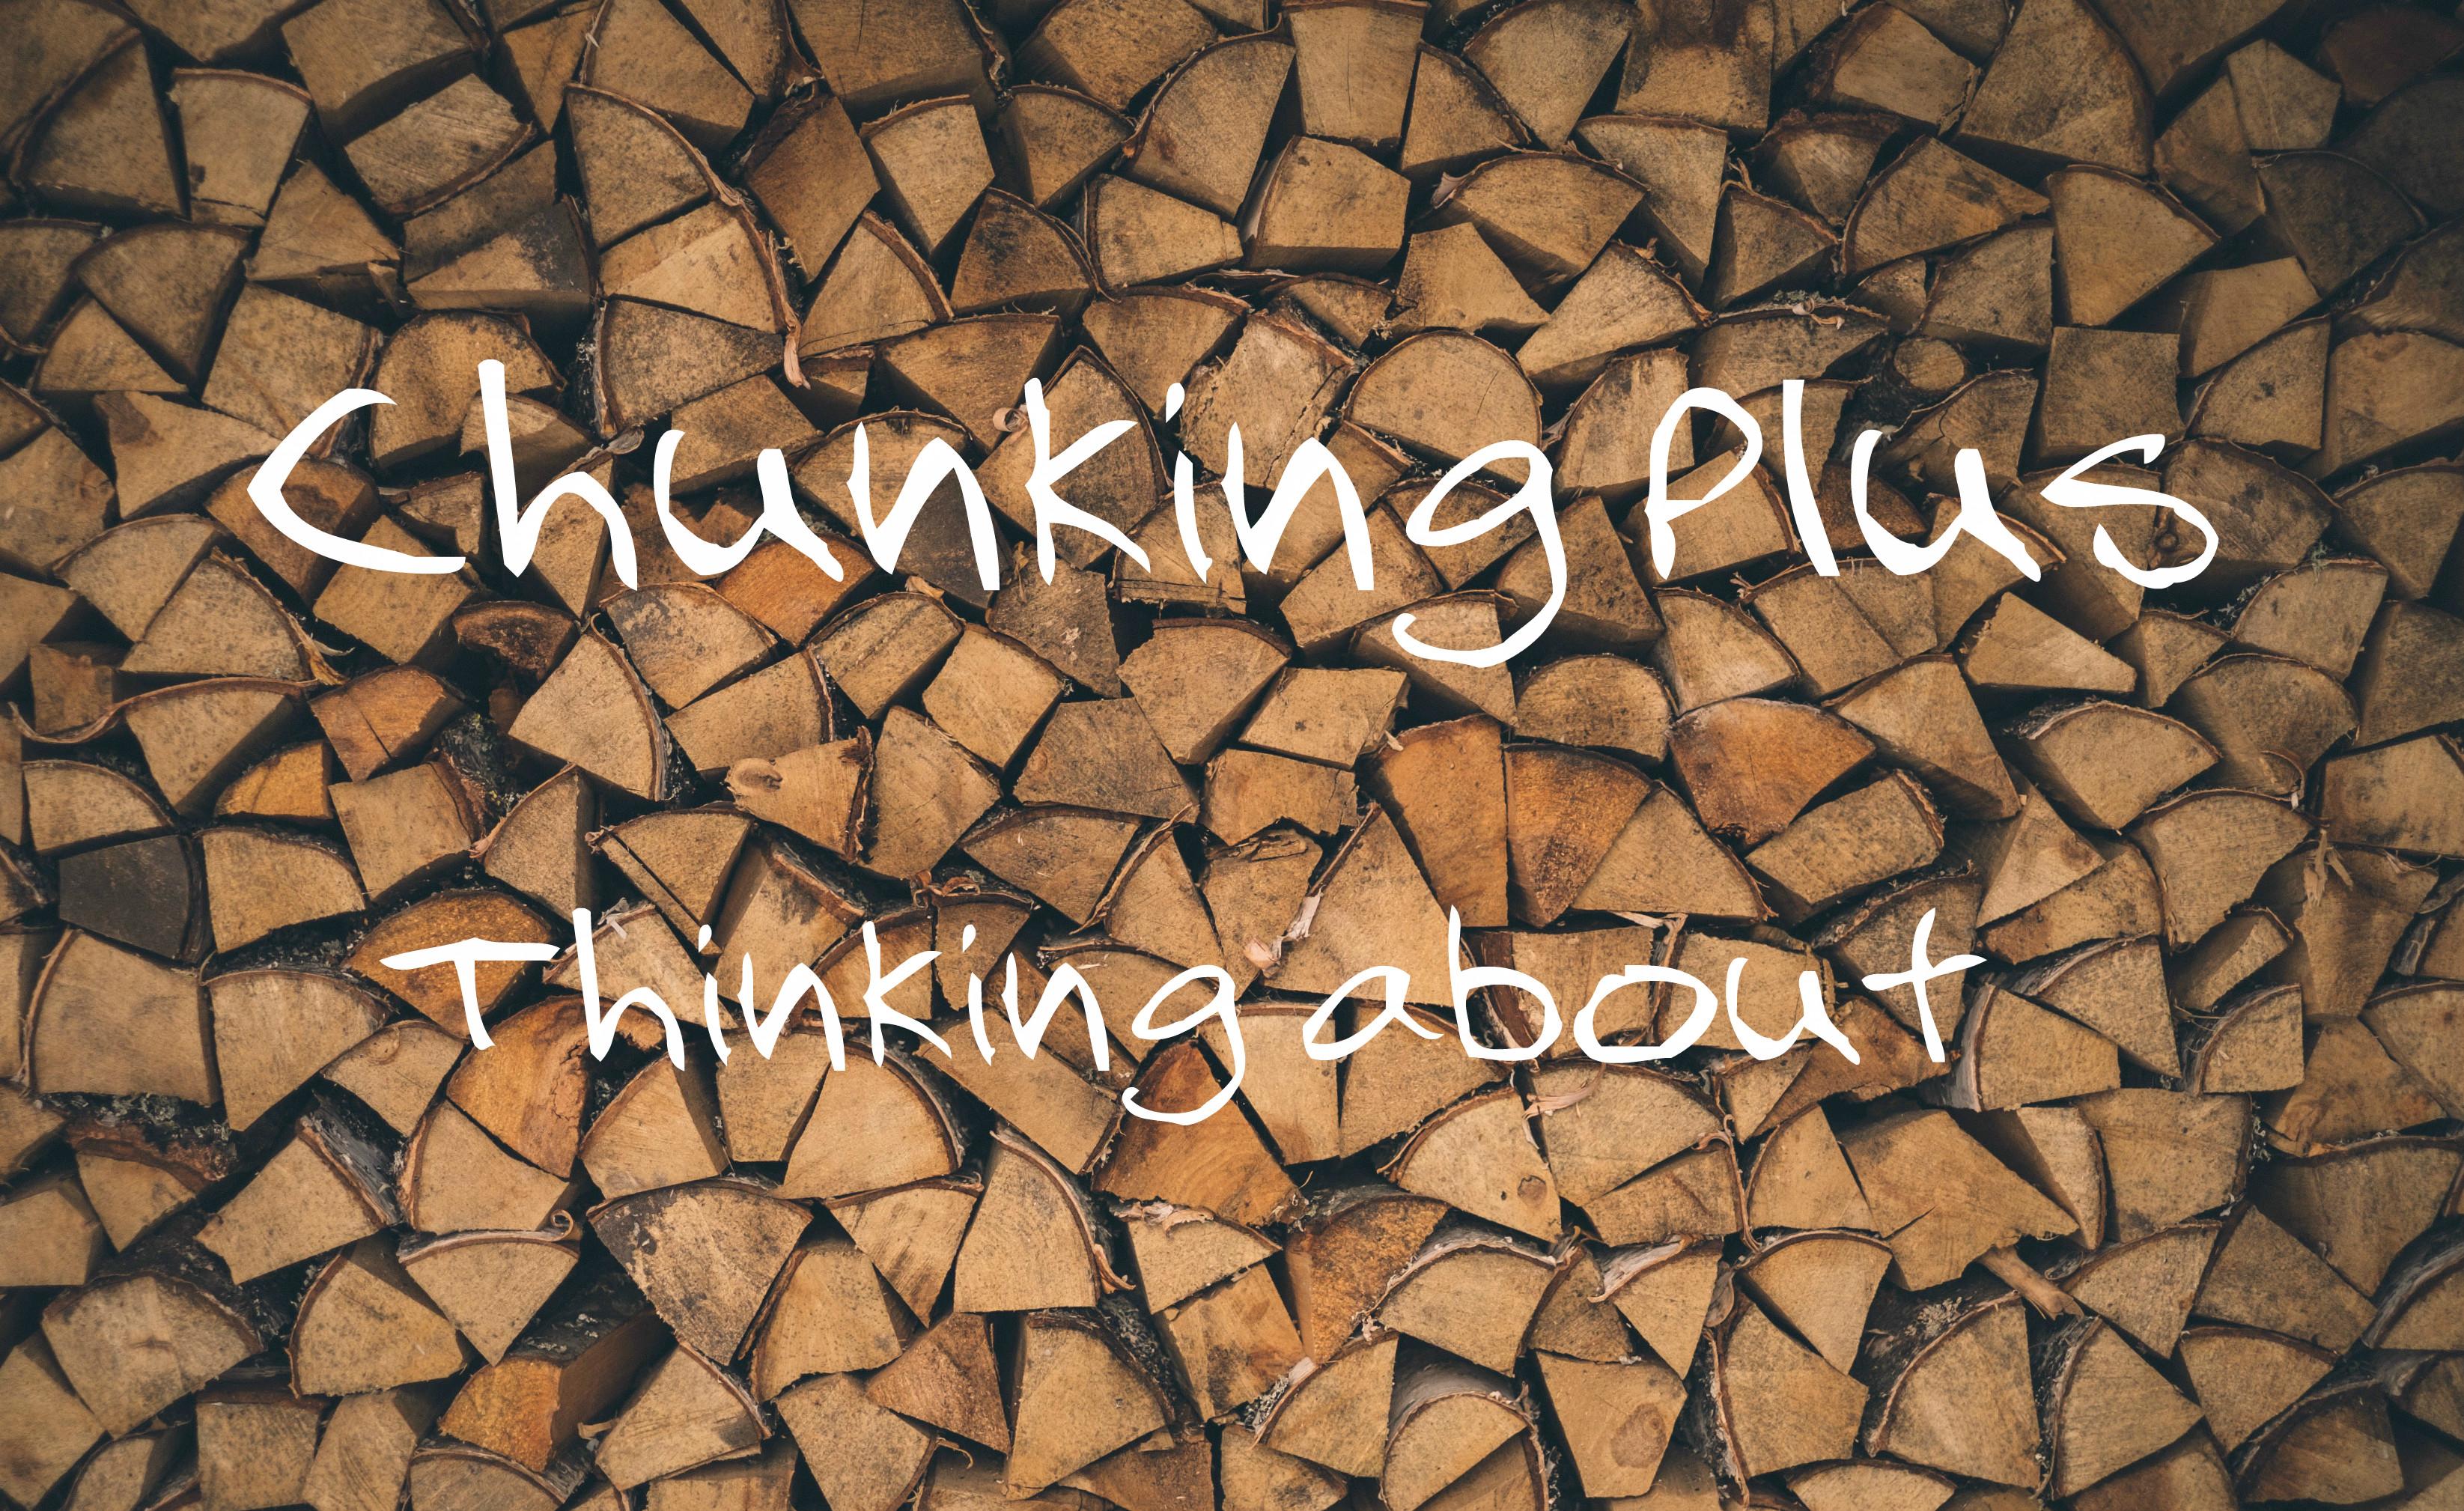 Chunking Plus